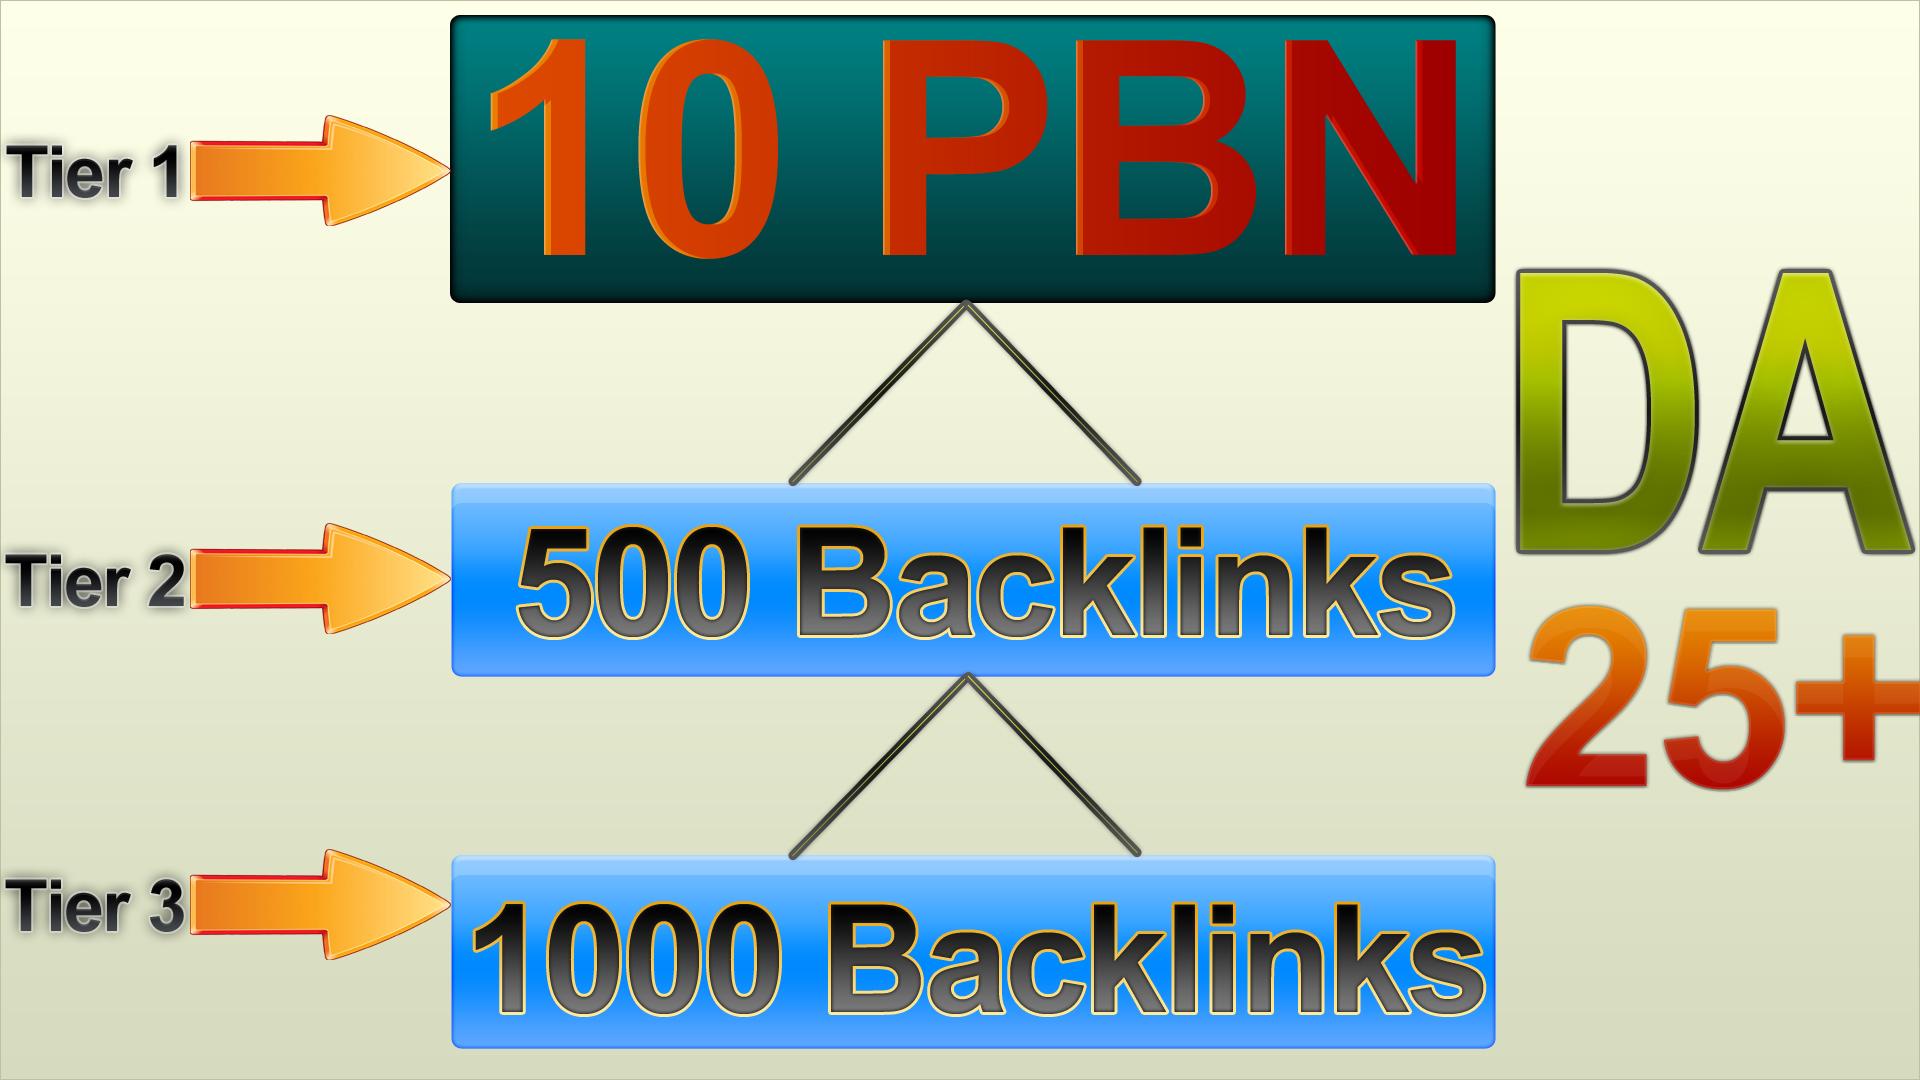 10 High DA 25+ Homepage Dofollow PBN Backlinks With Tire 3 LinkWheel Pyramid